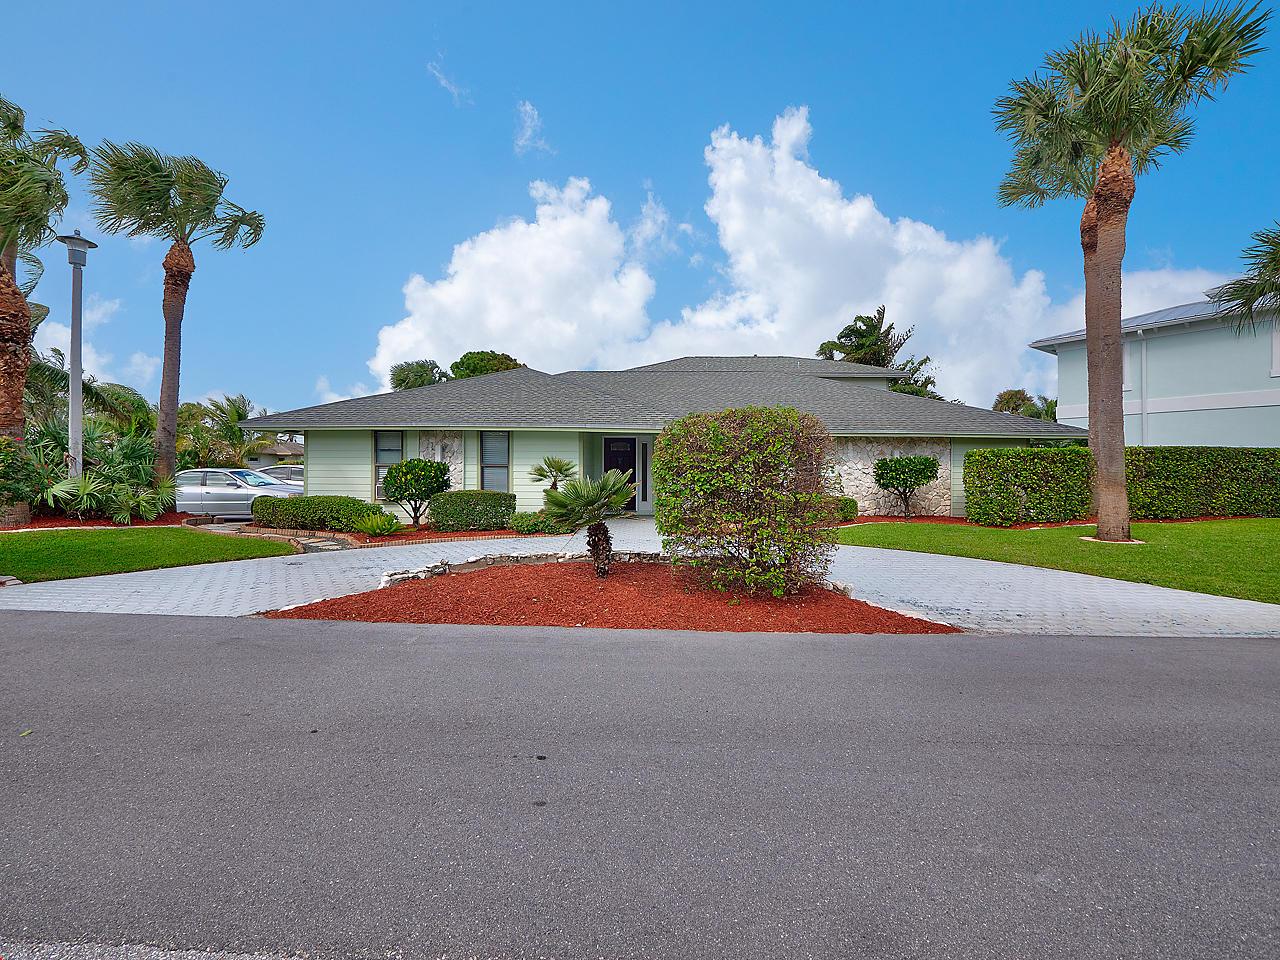 461 Juno Lane, Juno Beach, Florida 33408, 3 Bedrooms Bedrooms, ,3 BathroomsBathrooms,Rental,For Rent,Juno,RX-10672646